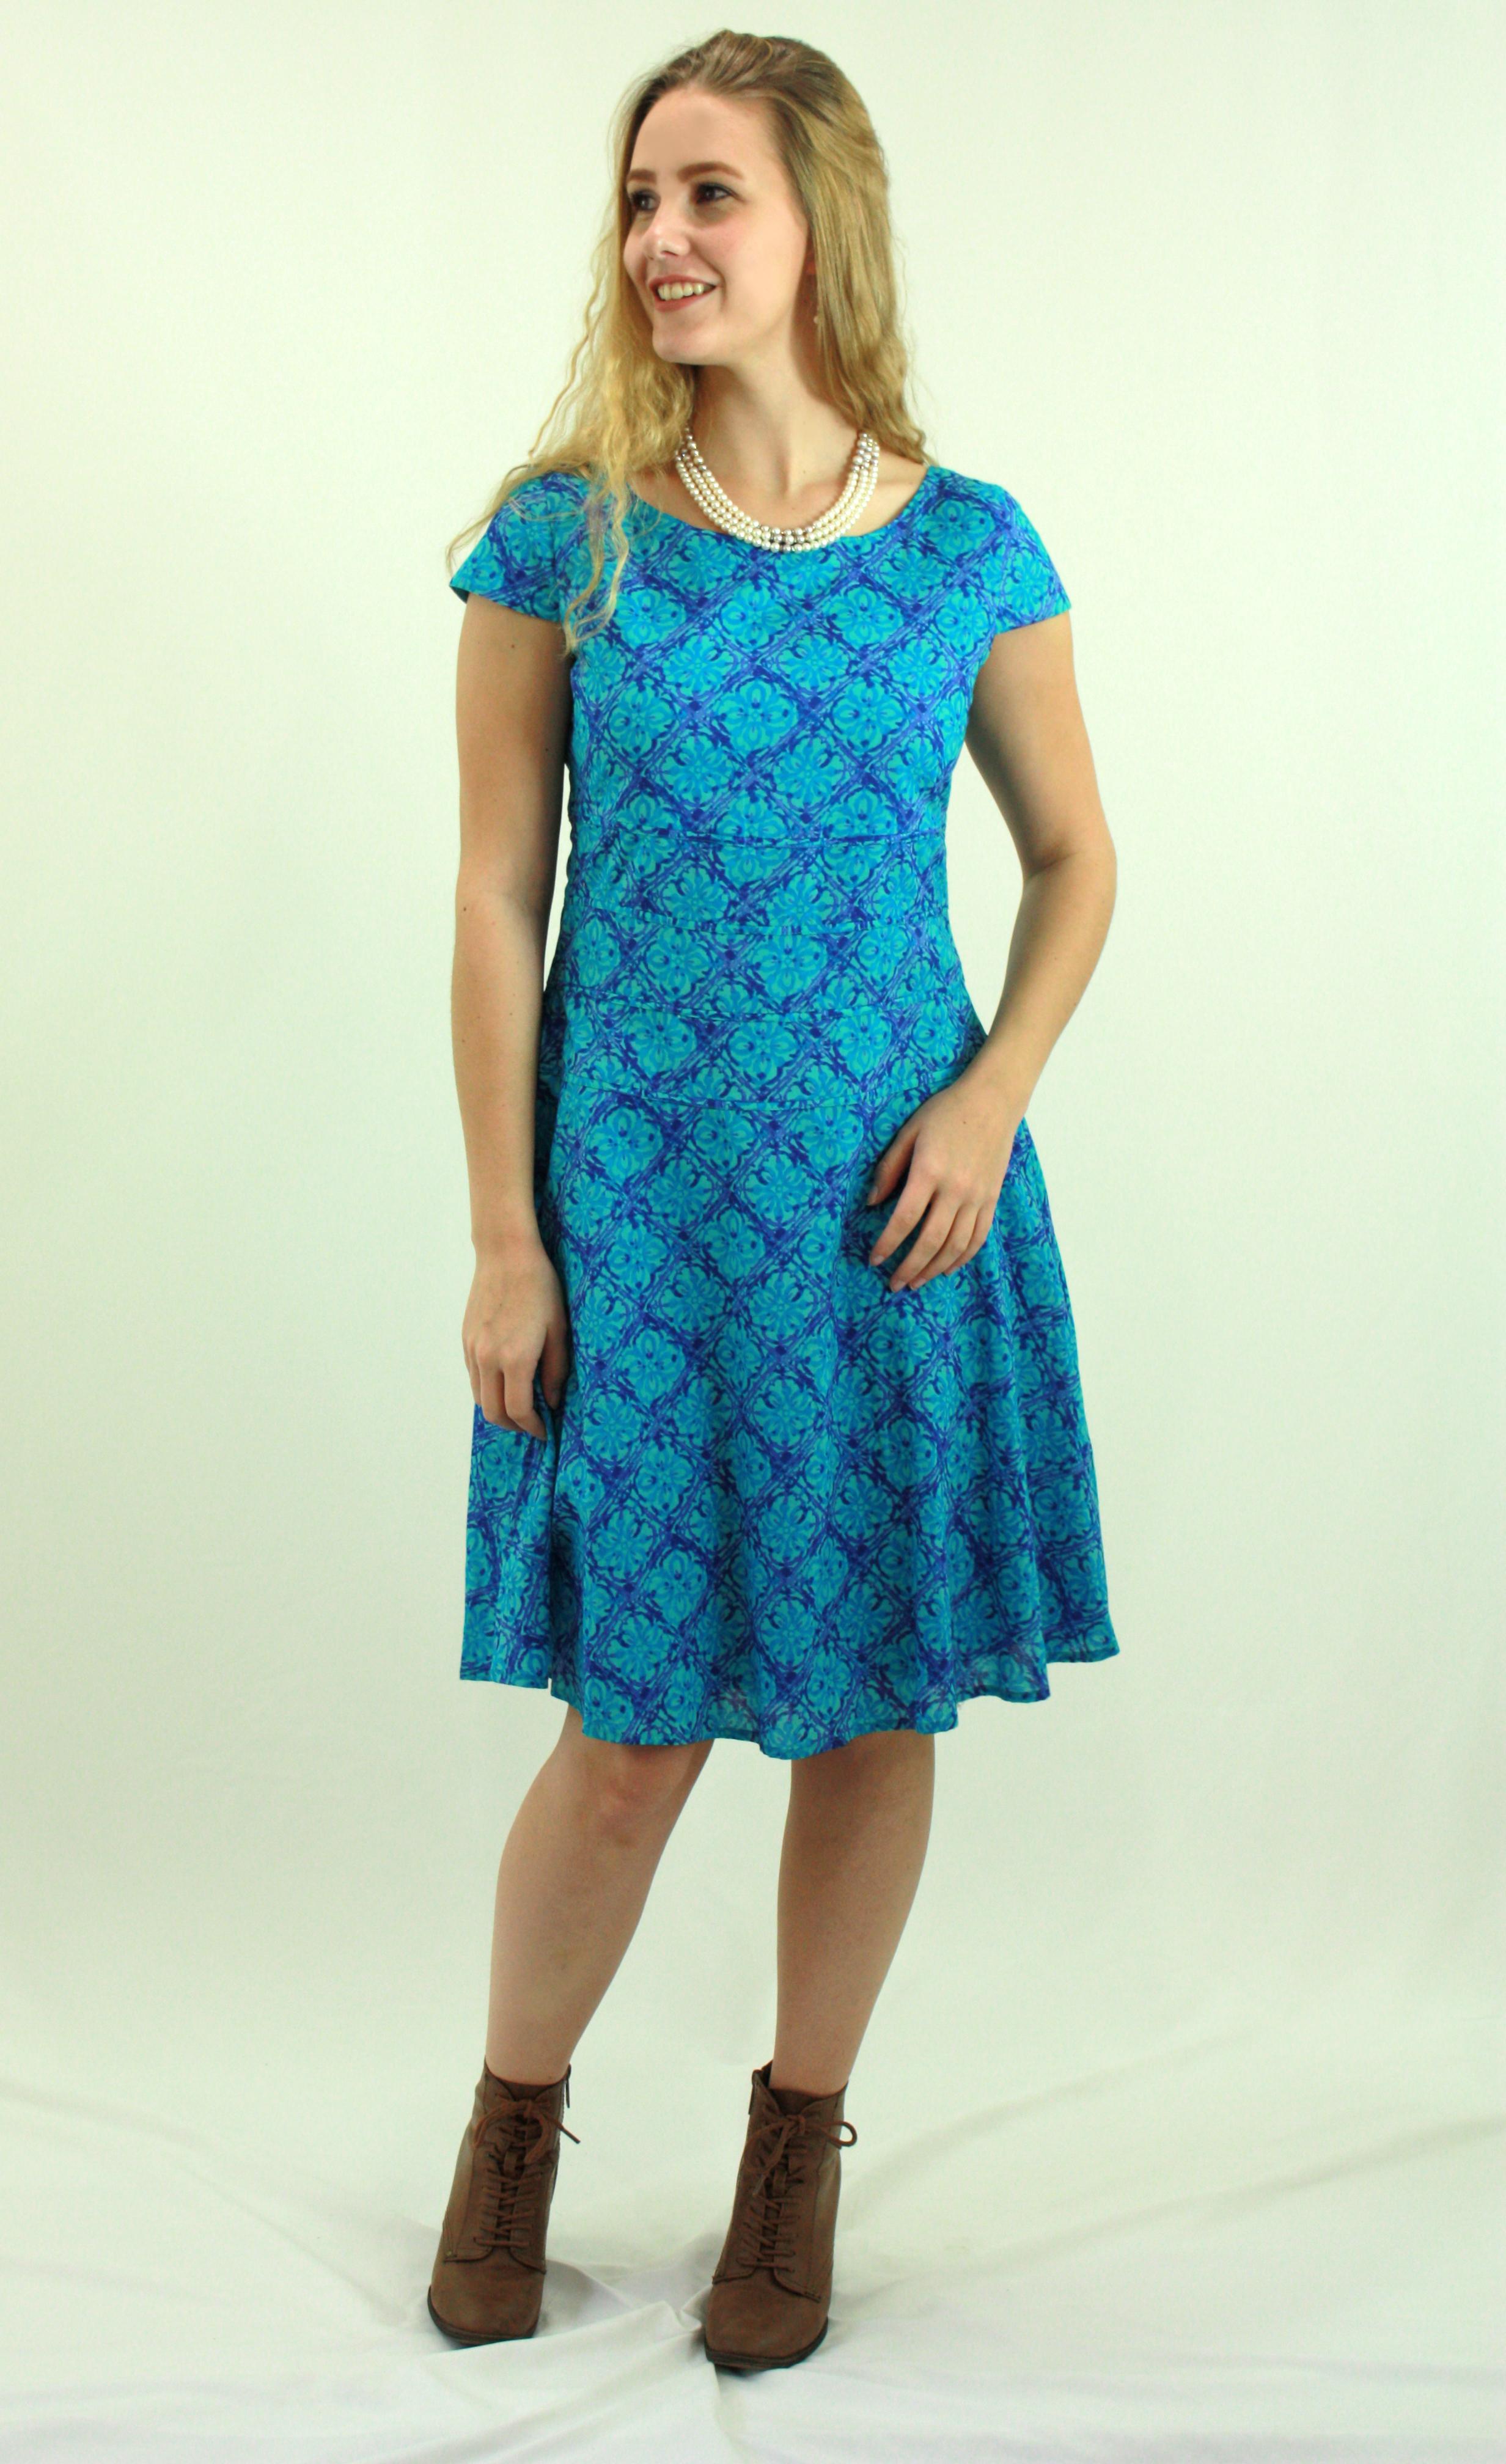 Turquoise Blue Dresses